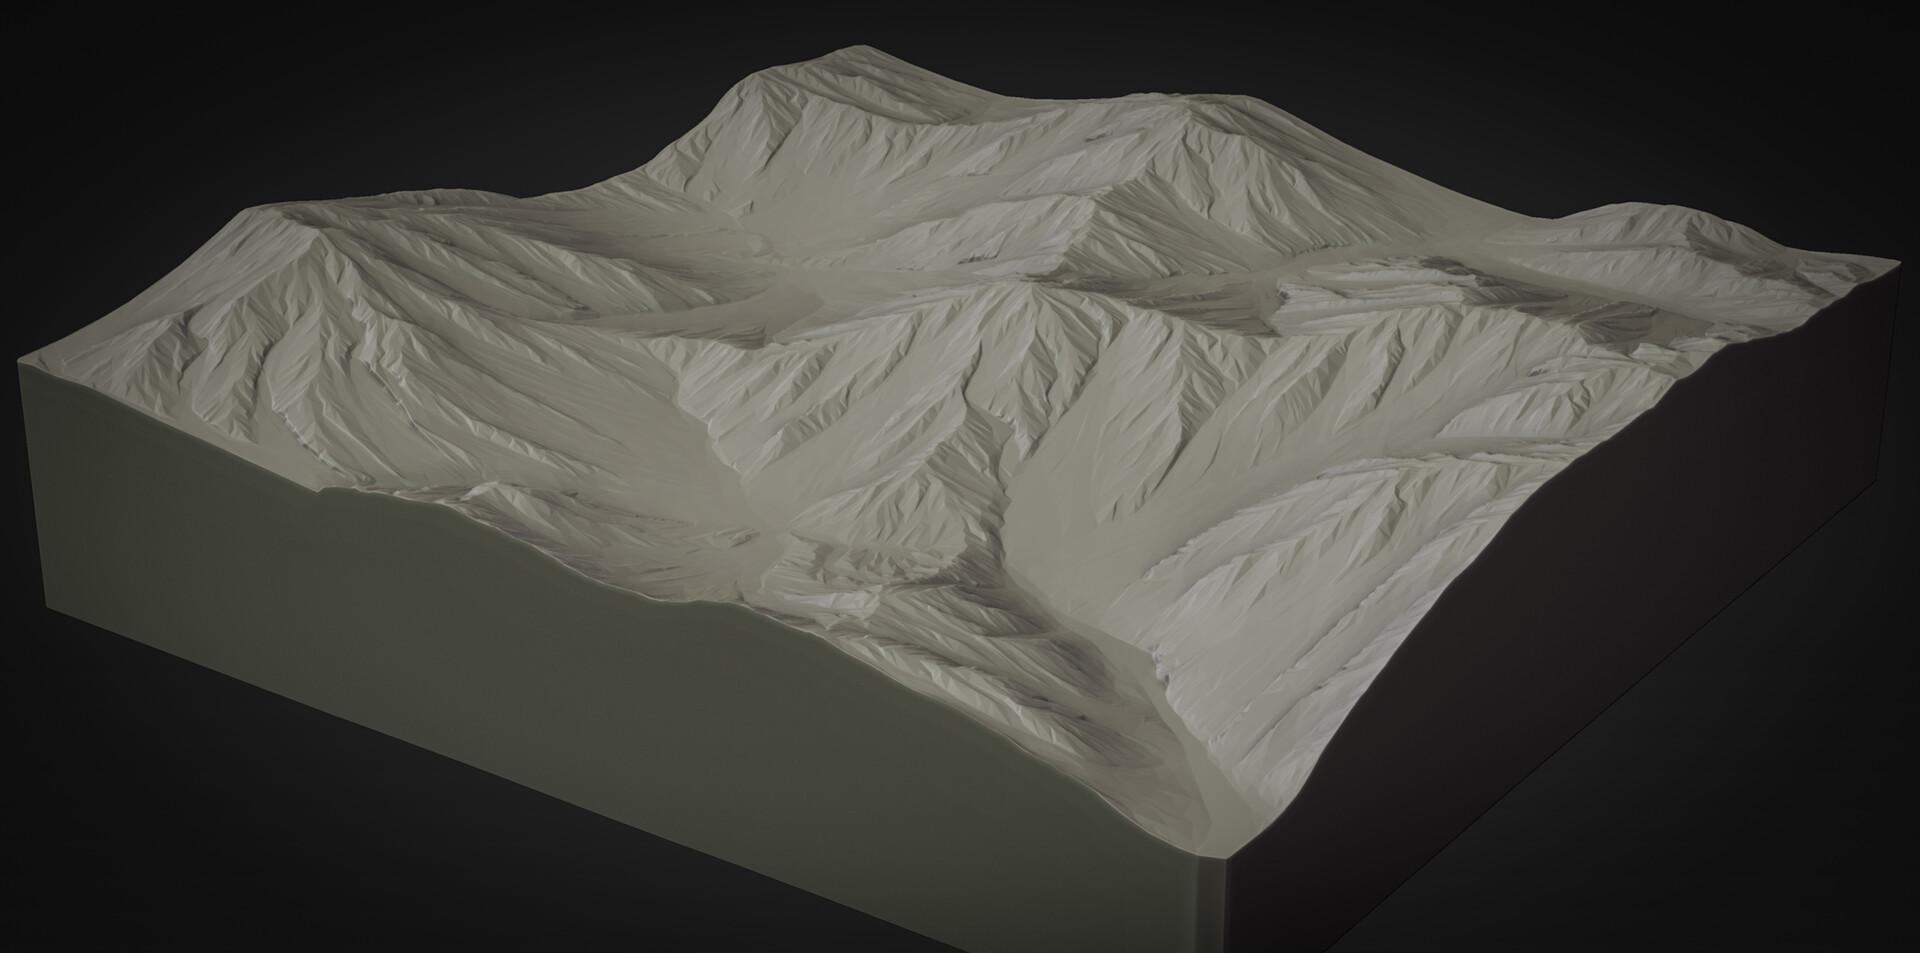 Martin teichmann terrain zbrush